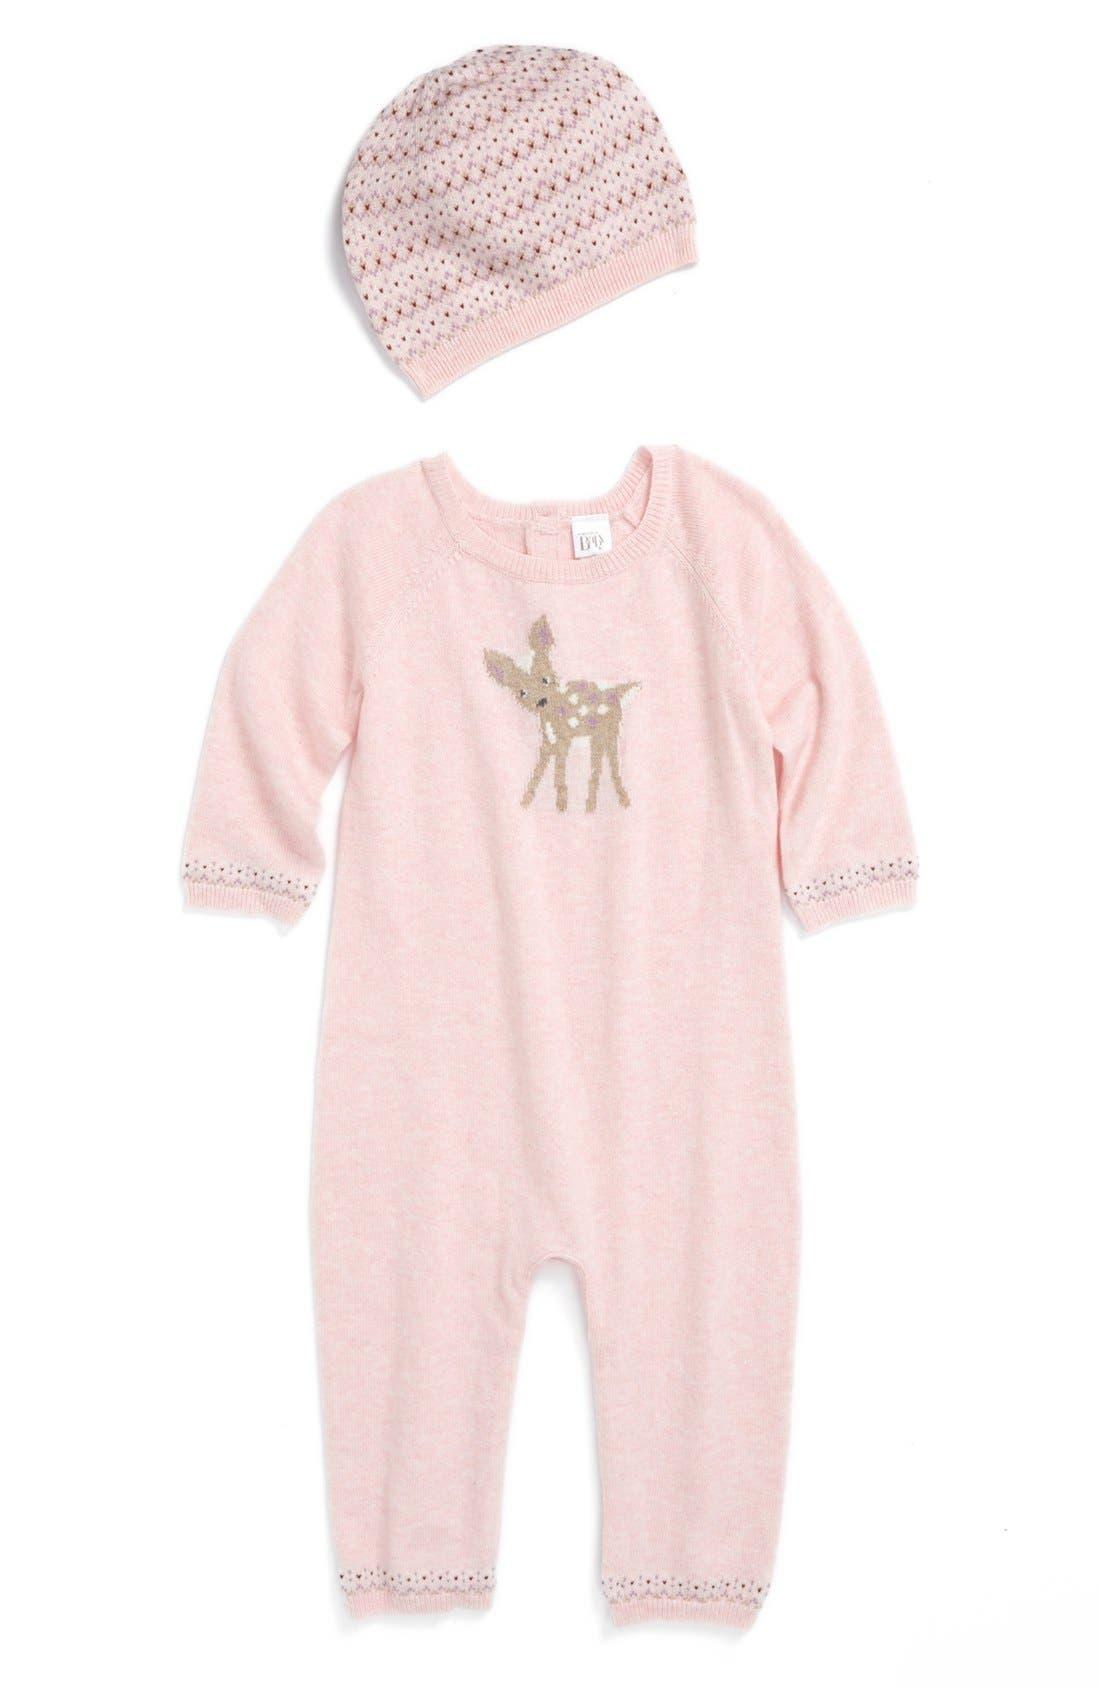 Alternate Image 1 Selected - Nordstrom Baby Romper & Hat (Baby Girls)